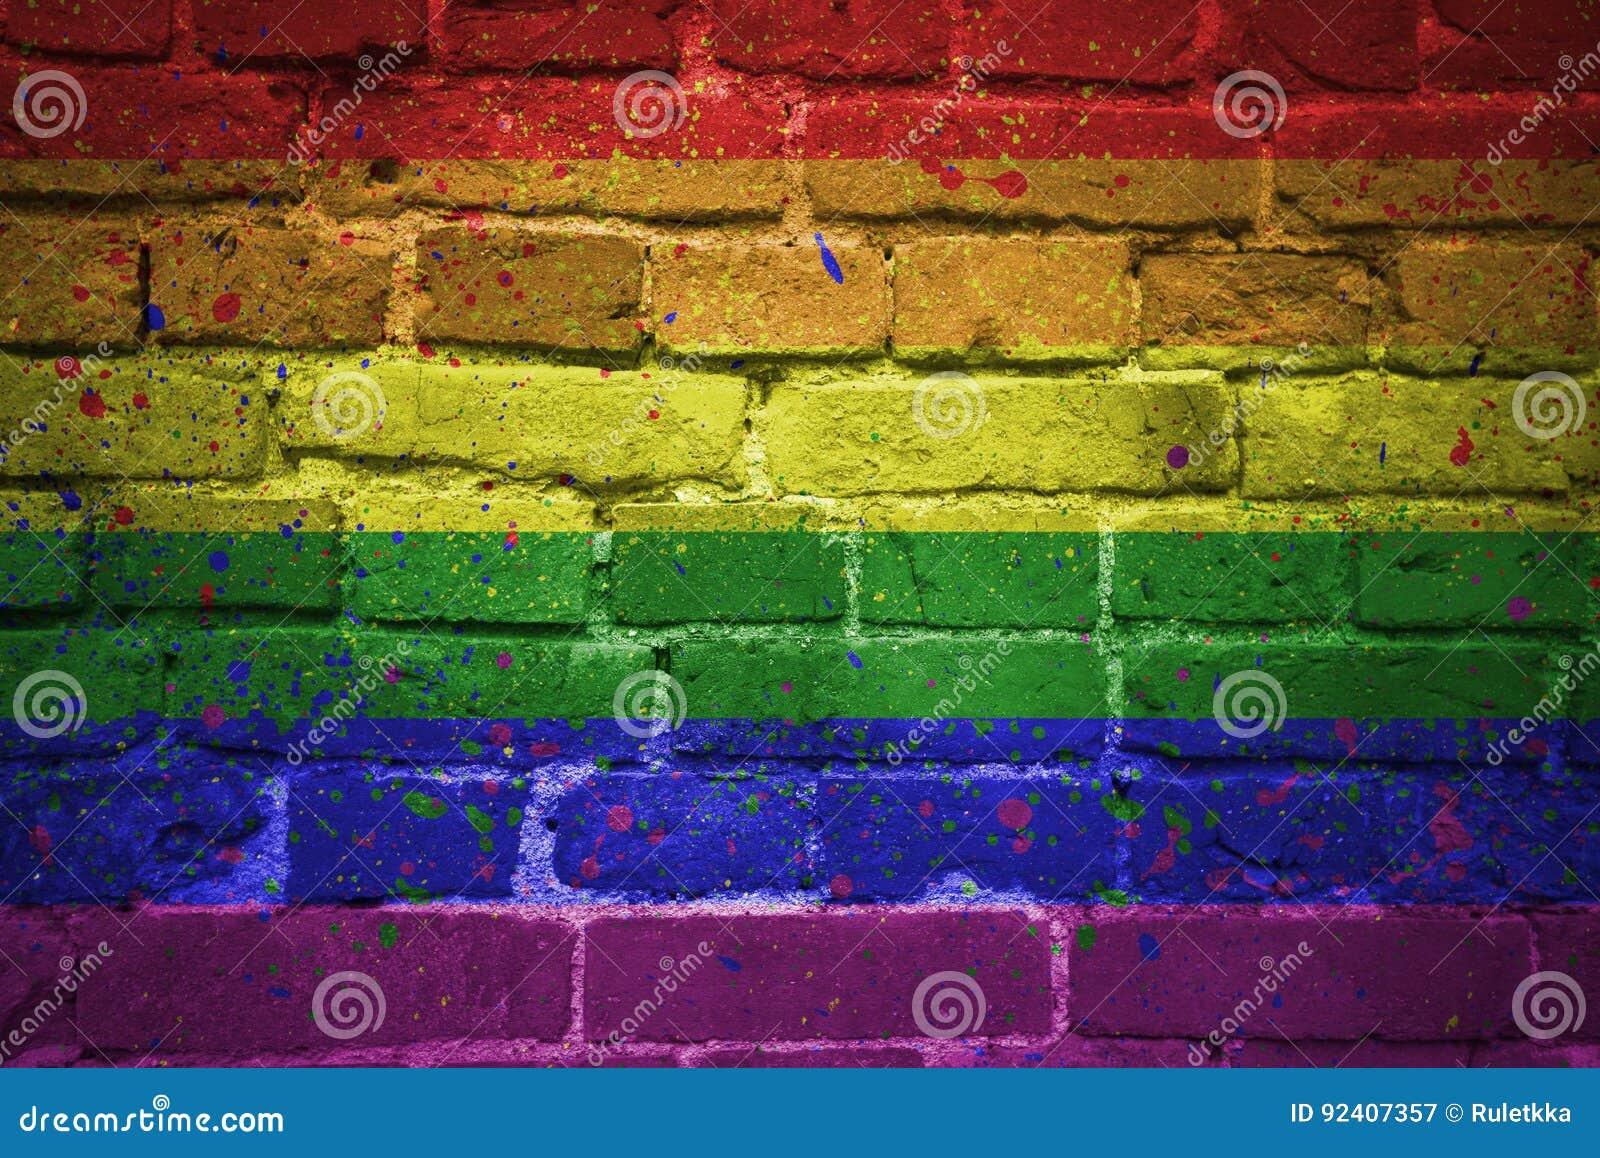 Painted gay pride rainbow flag on a brick wall